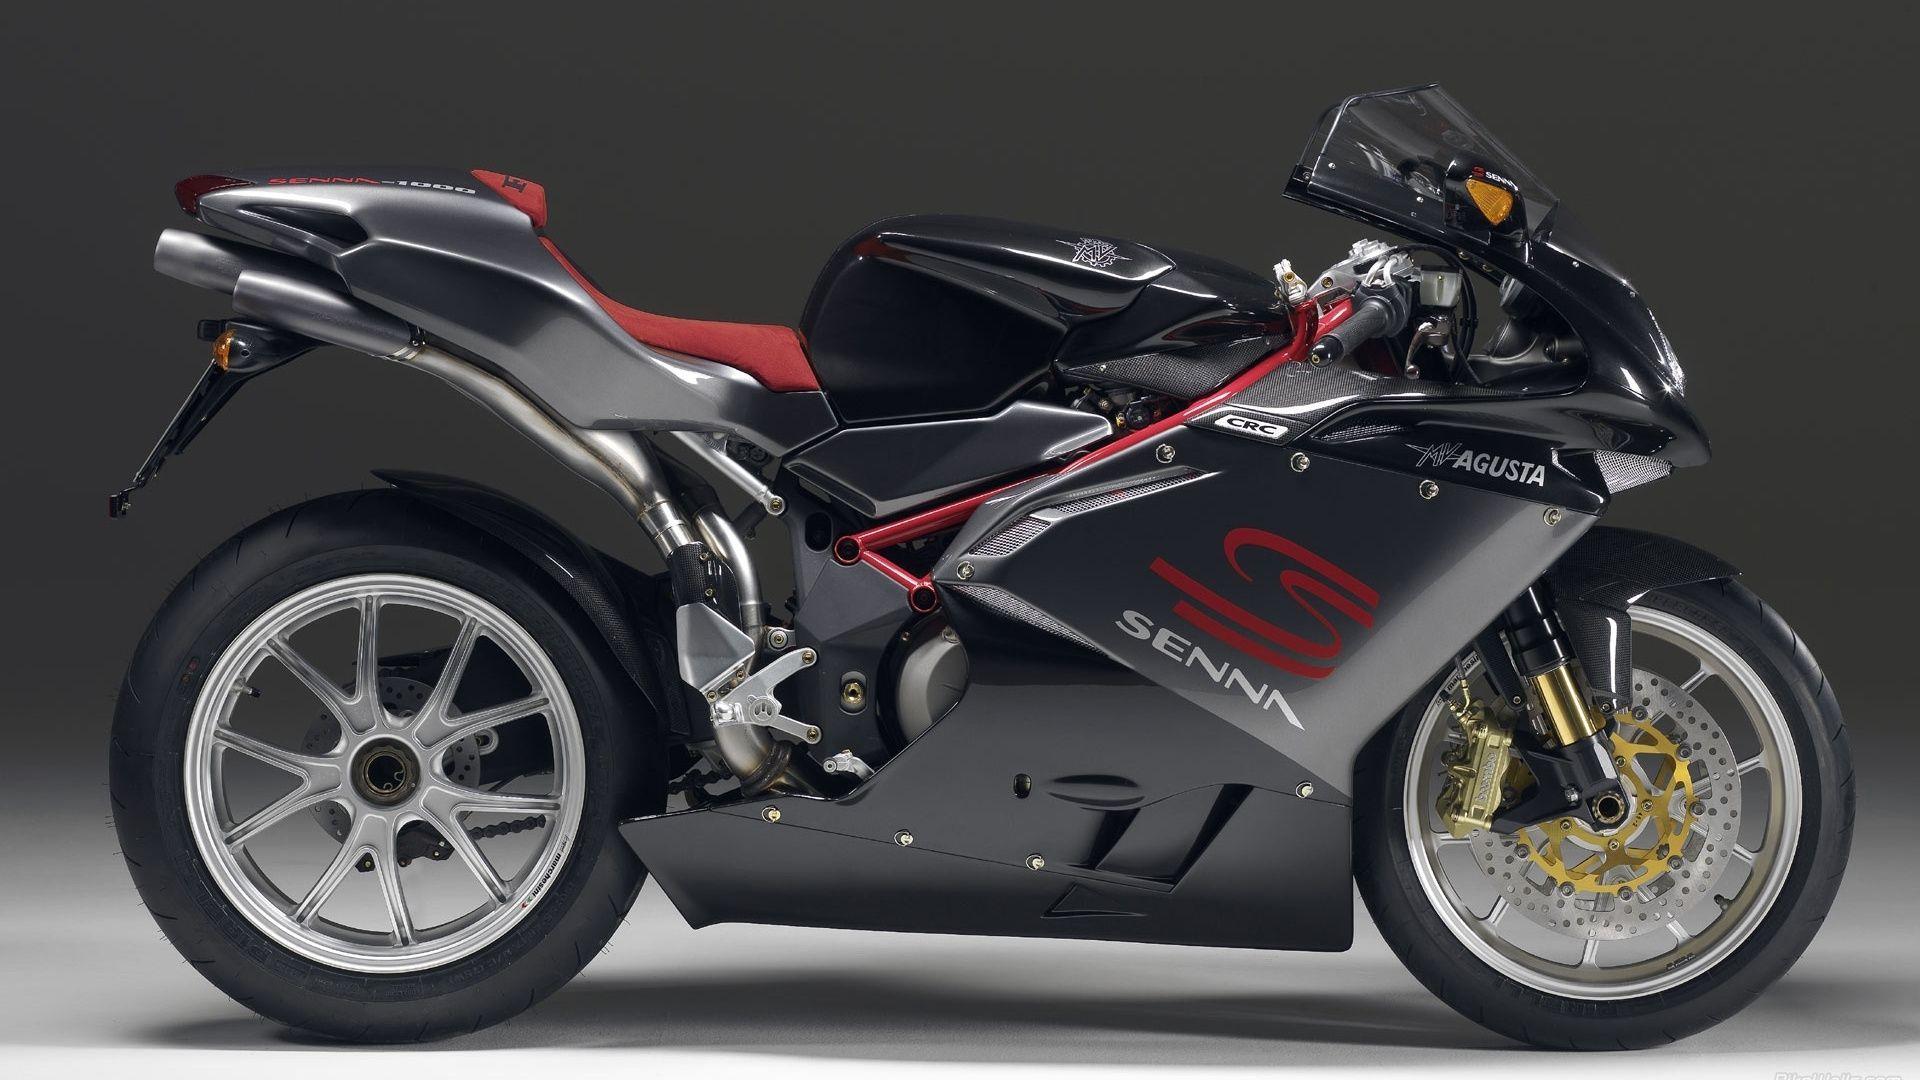 Bugatti Motorcycle Bugatti Motorcycle Bugatti Motorcycle Mv